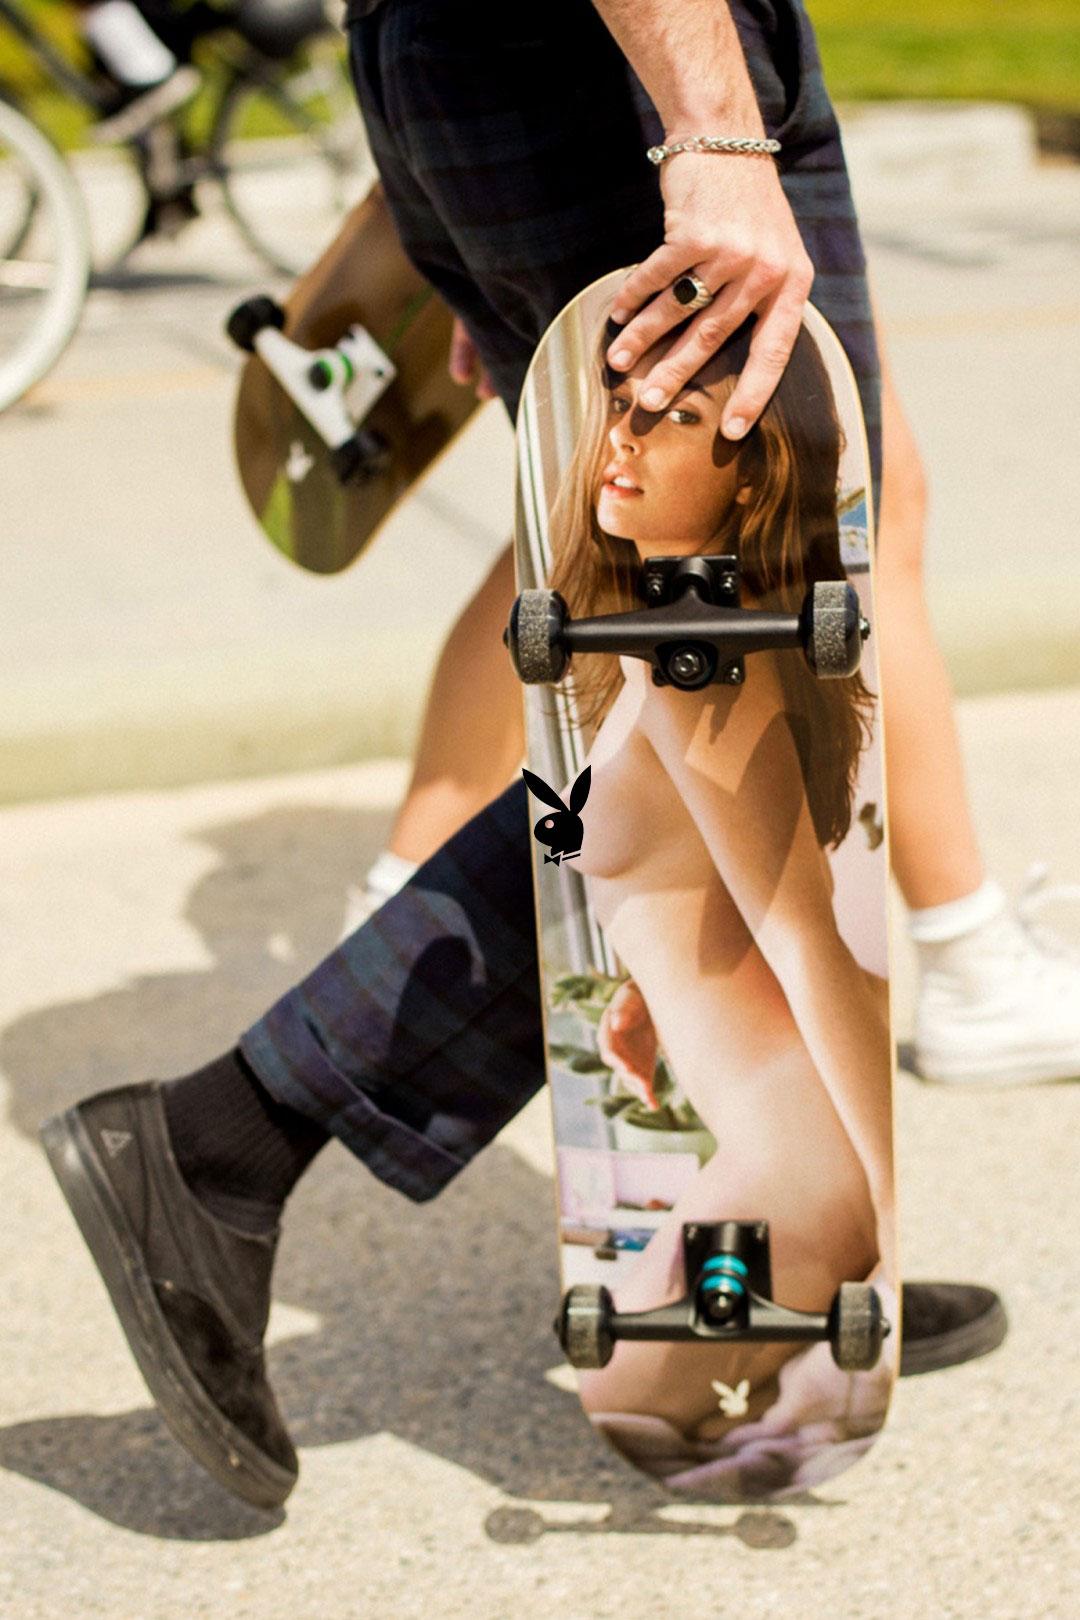 Skateboard-New6_